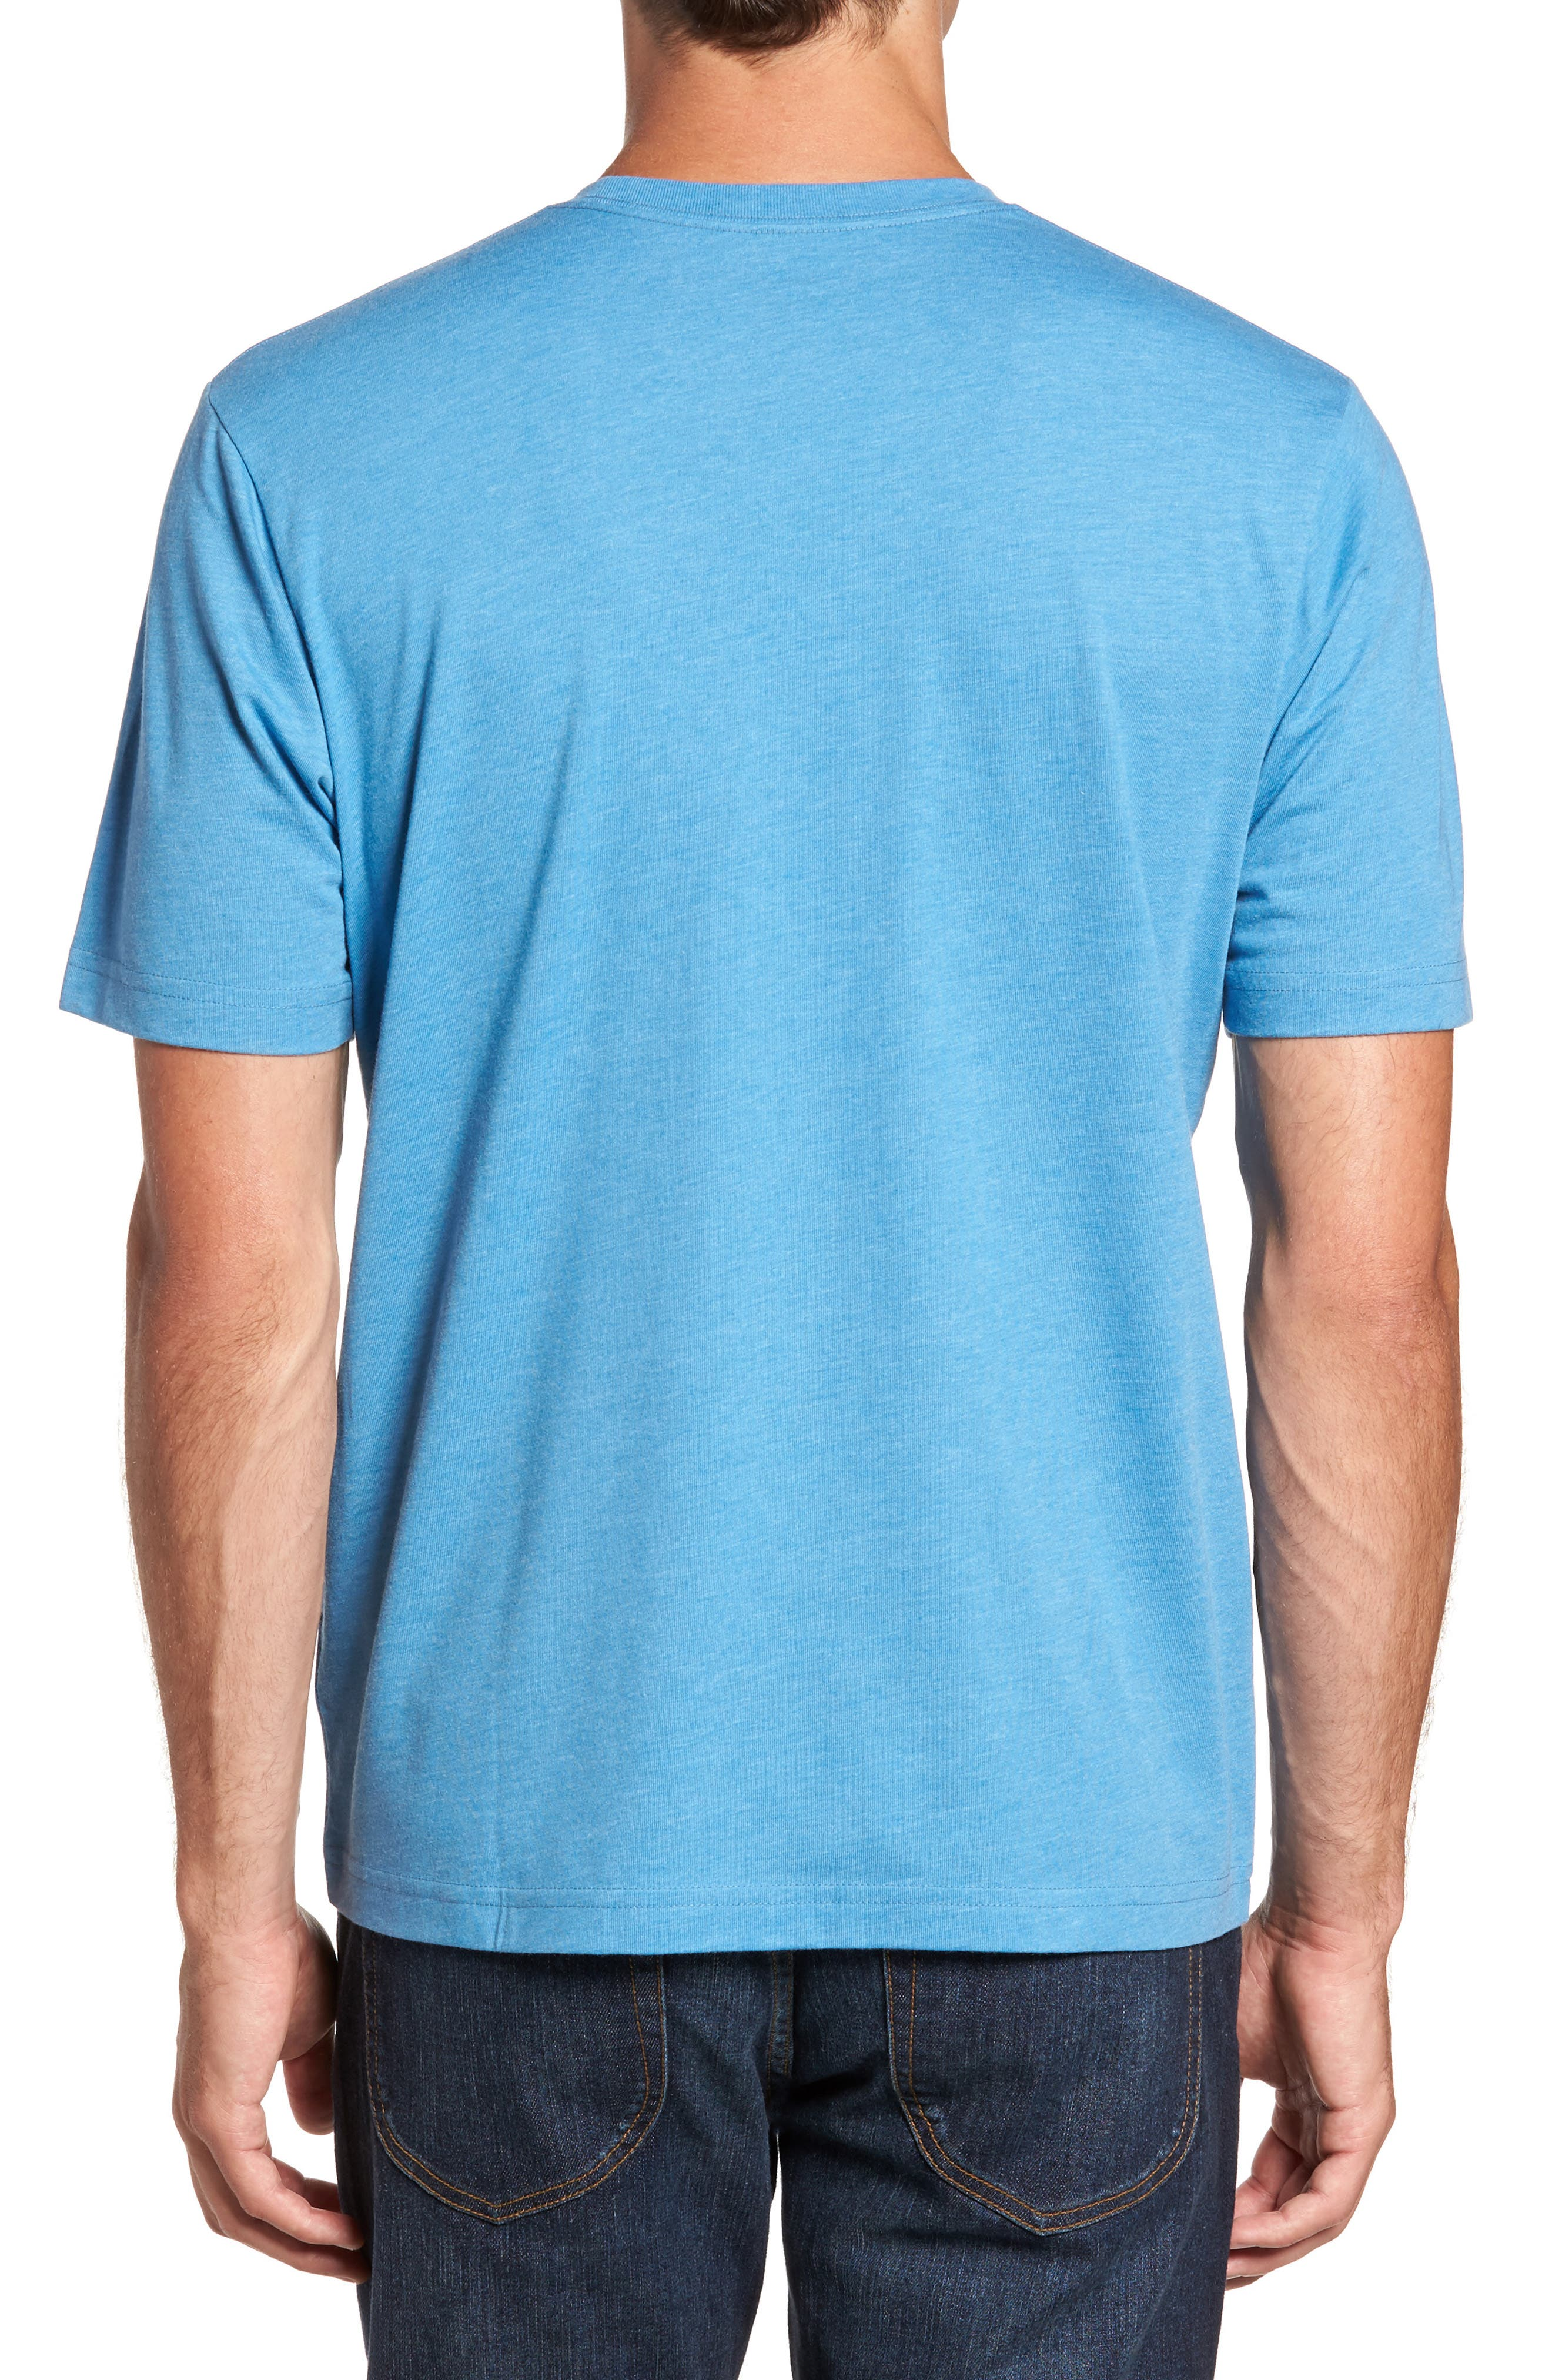 Life Champion Graphic T-Shirt,                             Alternate thumbnail 2, color,                             400